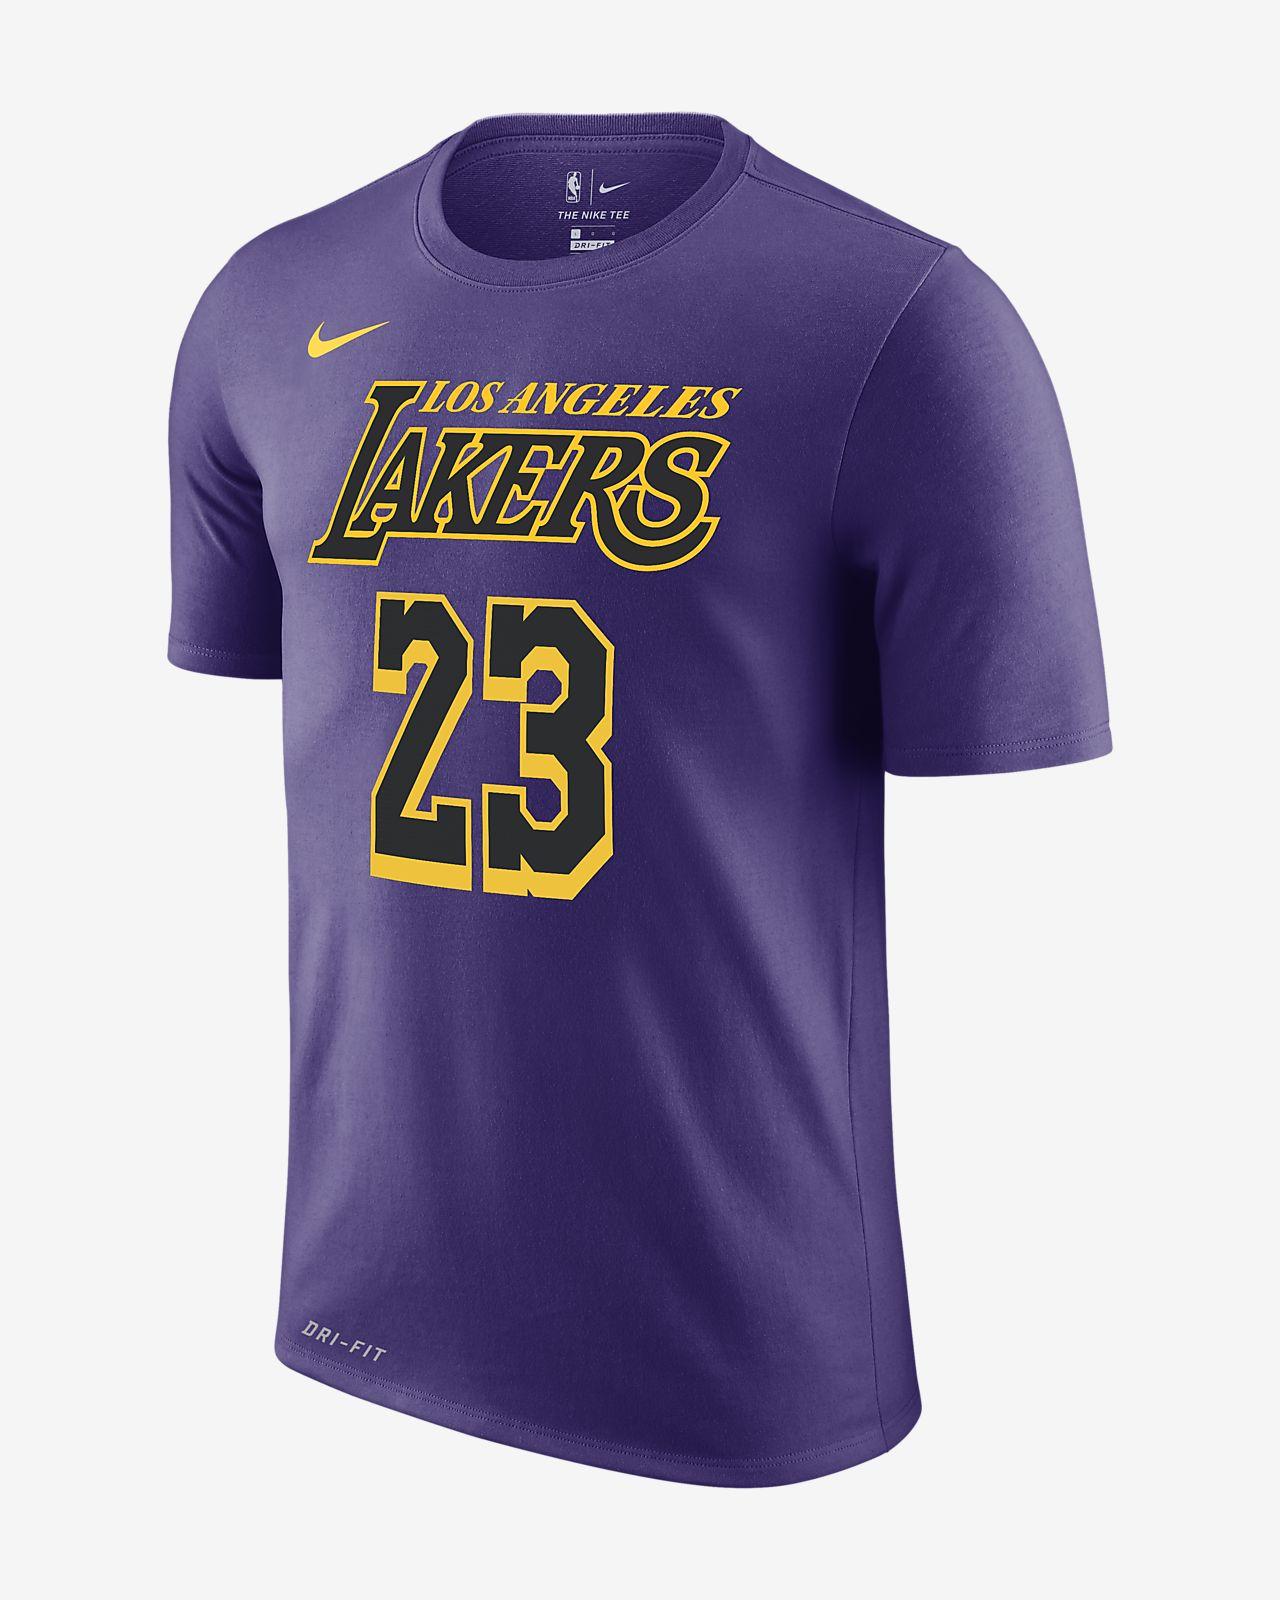 abd278f8970 LeBron James Los Angeles Lakers City Edition Nike Dri-FIT Men s NBA ...